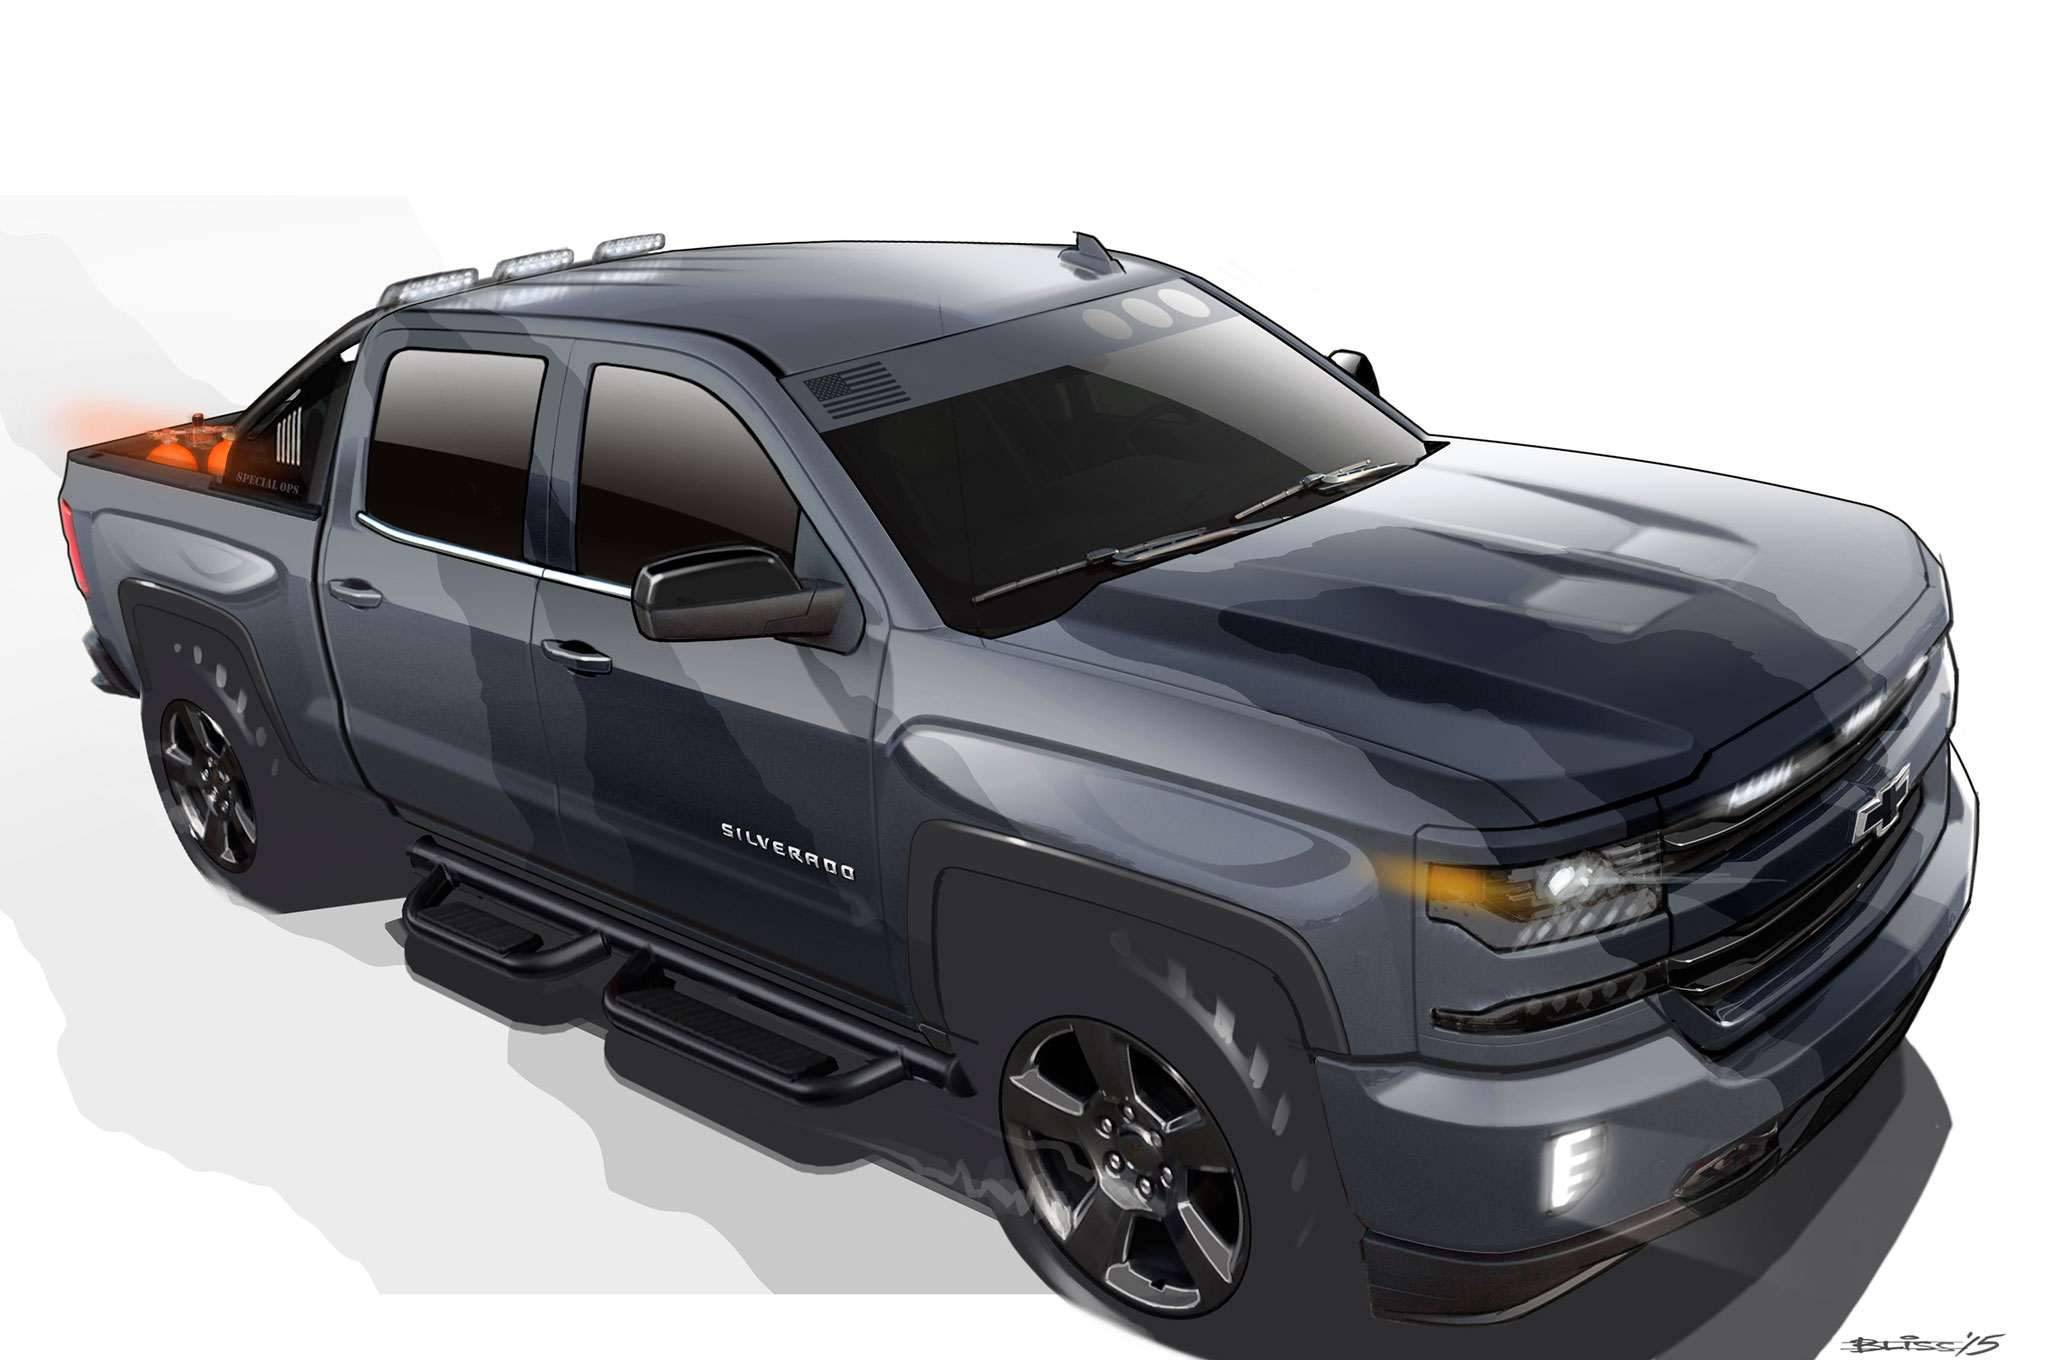 Chevrolet Silverado Special Ops Headed to Production